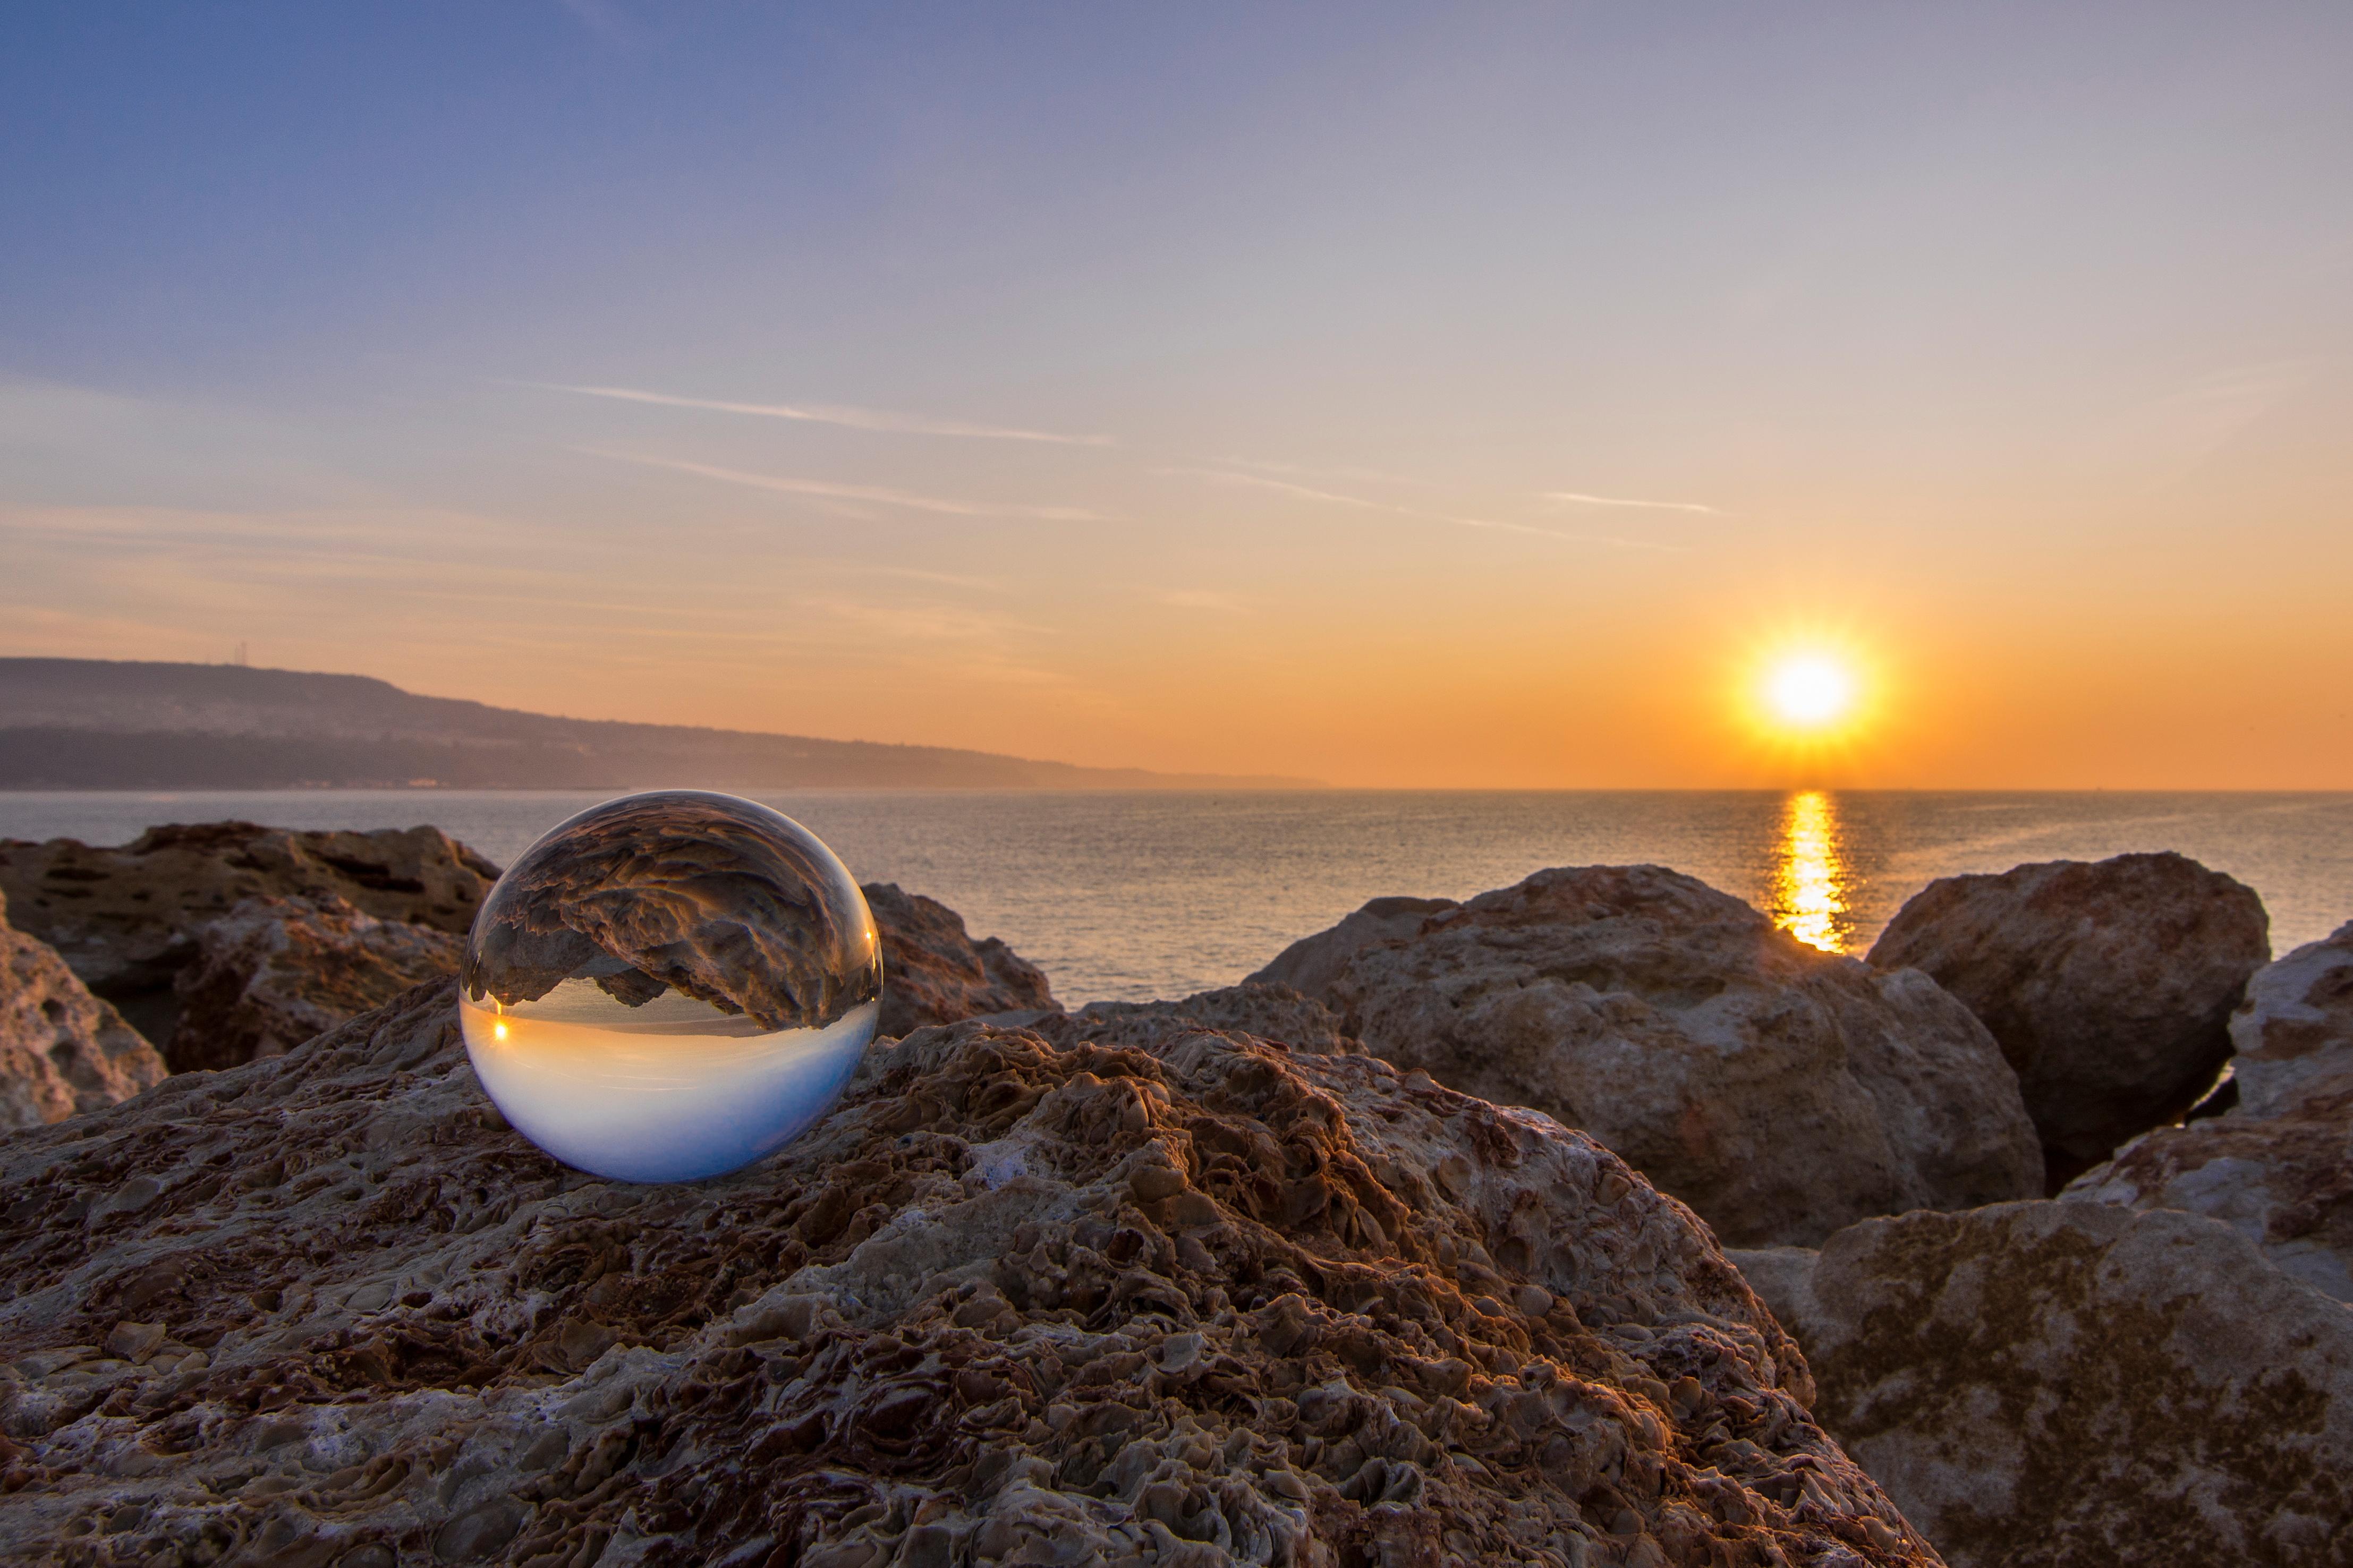 Sunrise-and-a-glass-ball-near-the-sea-854619484_4429x2952.jpeg